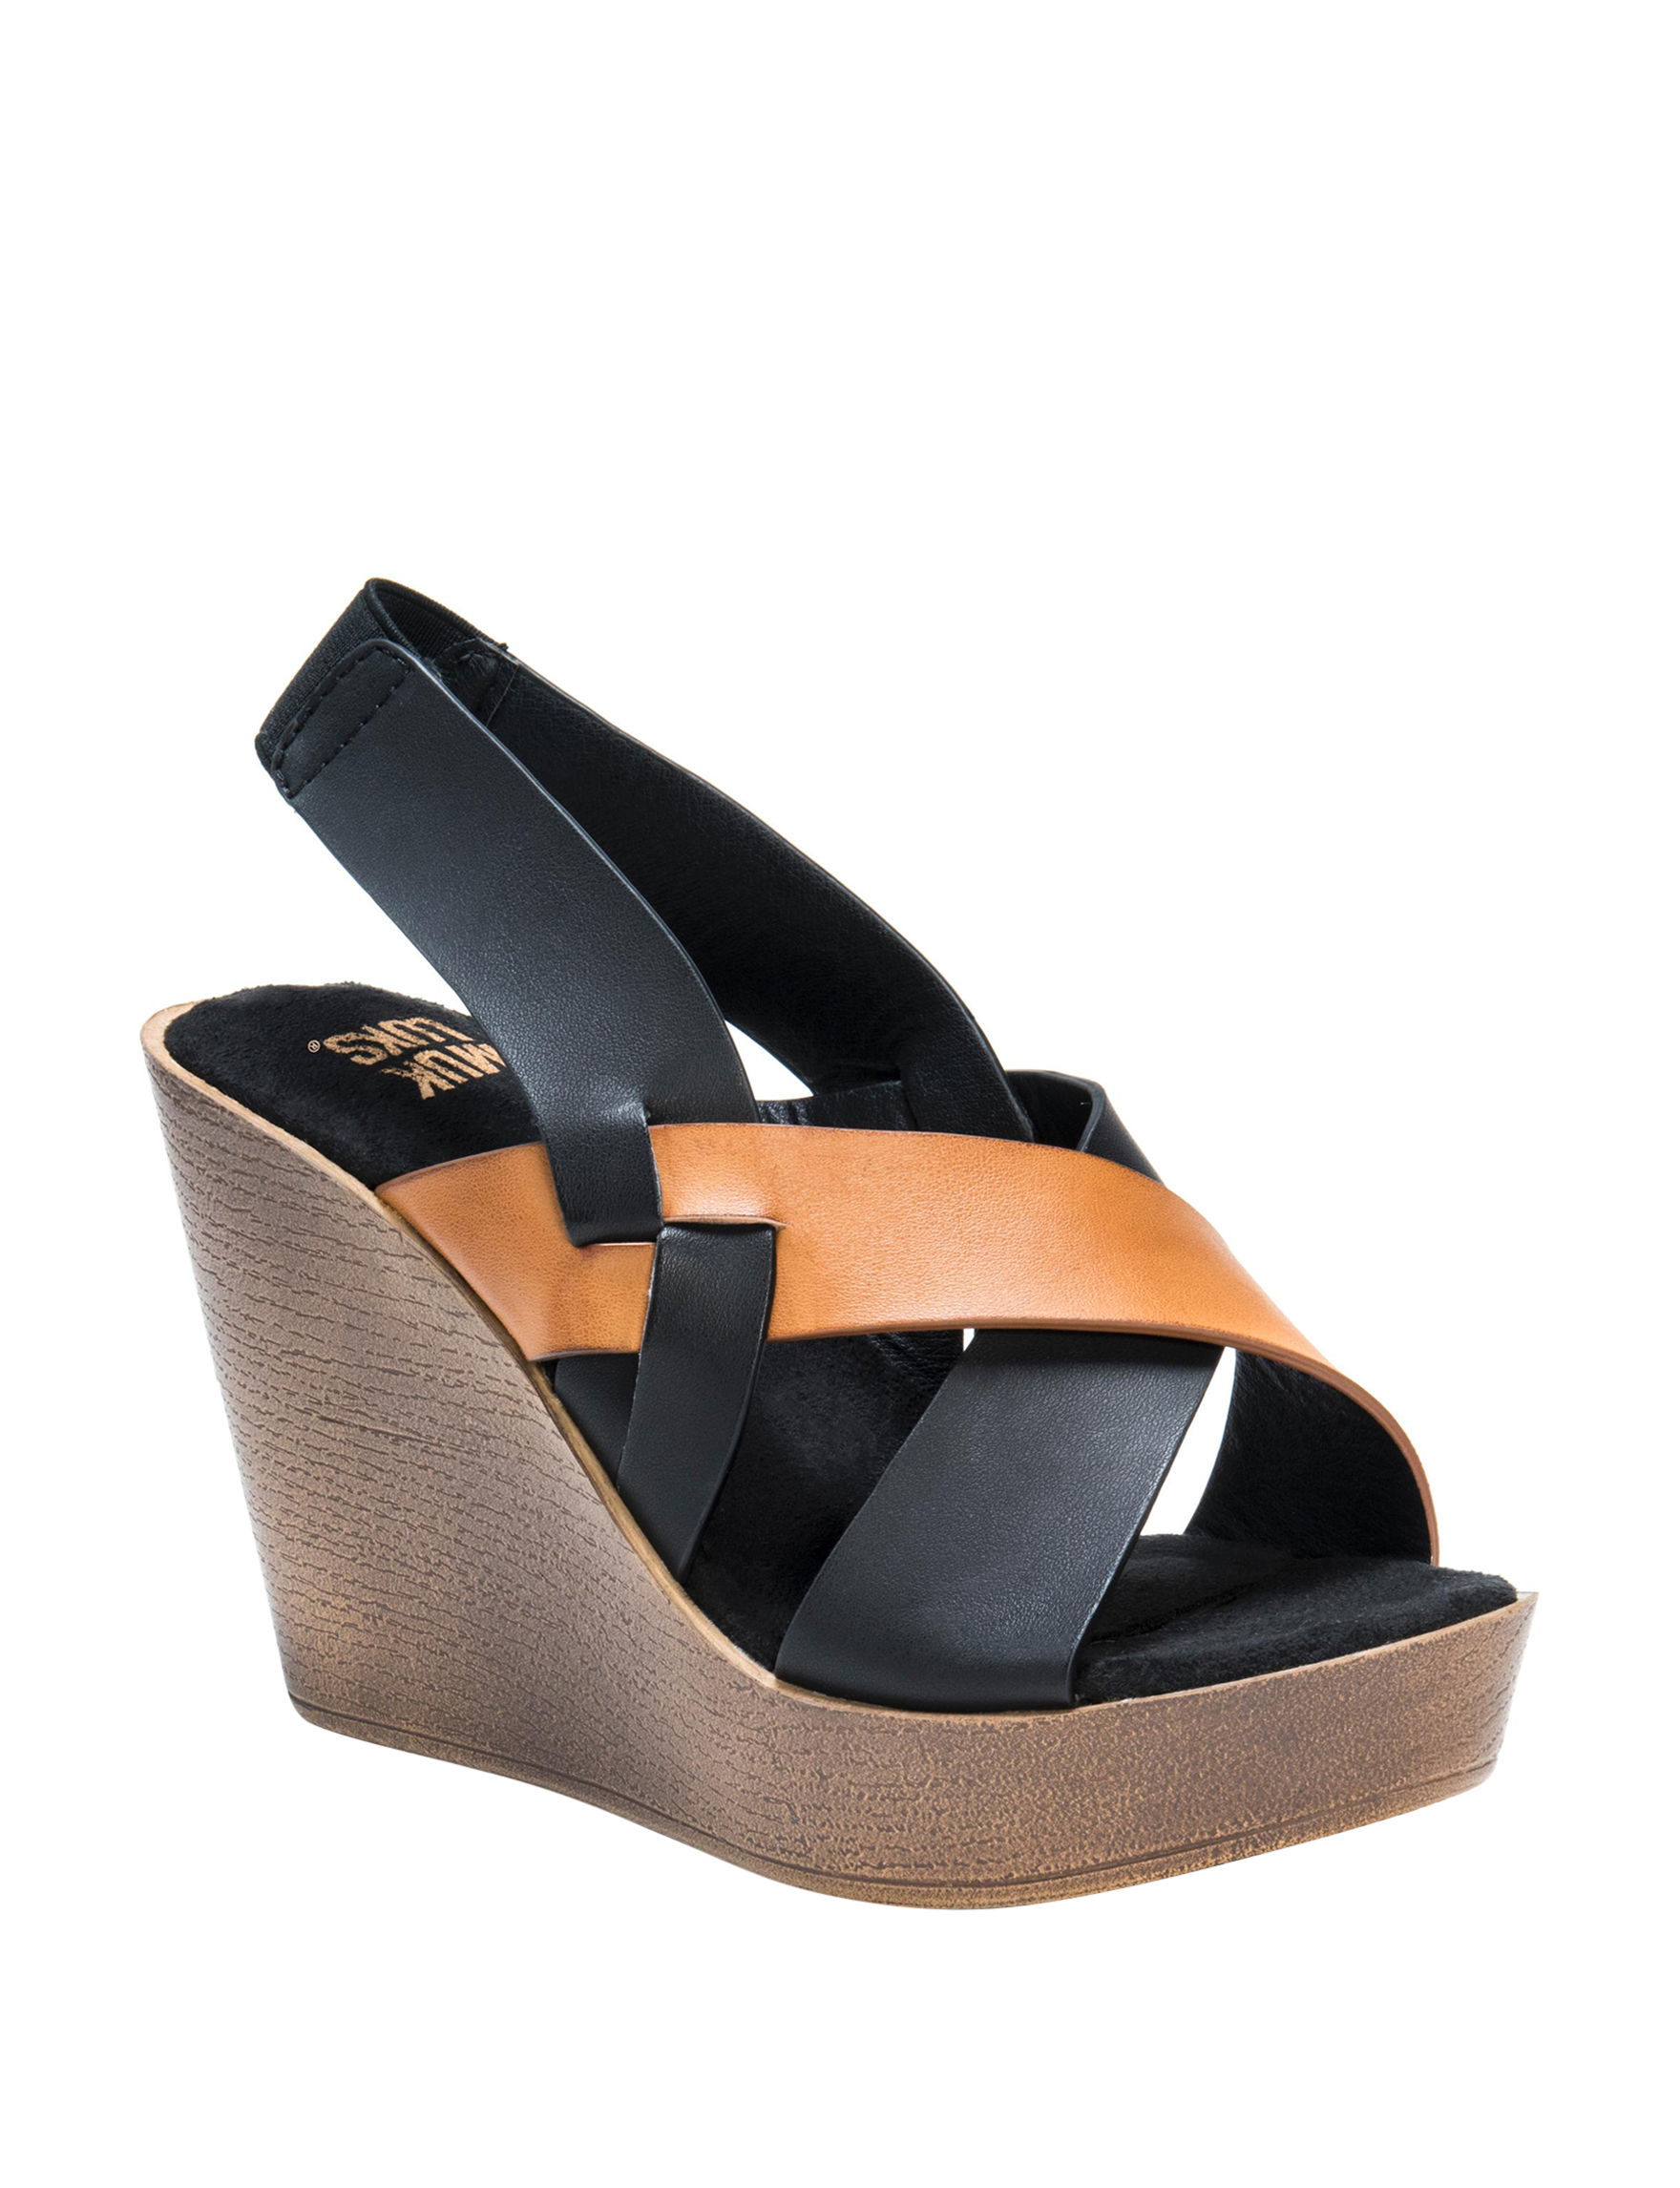 Muk Luks Cognac Wedge Sandals